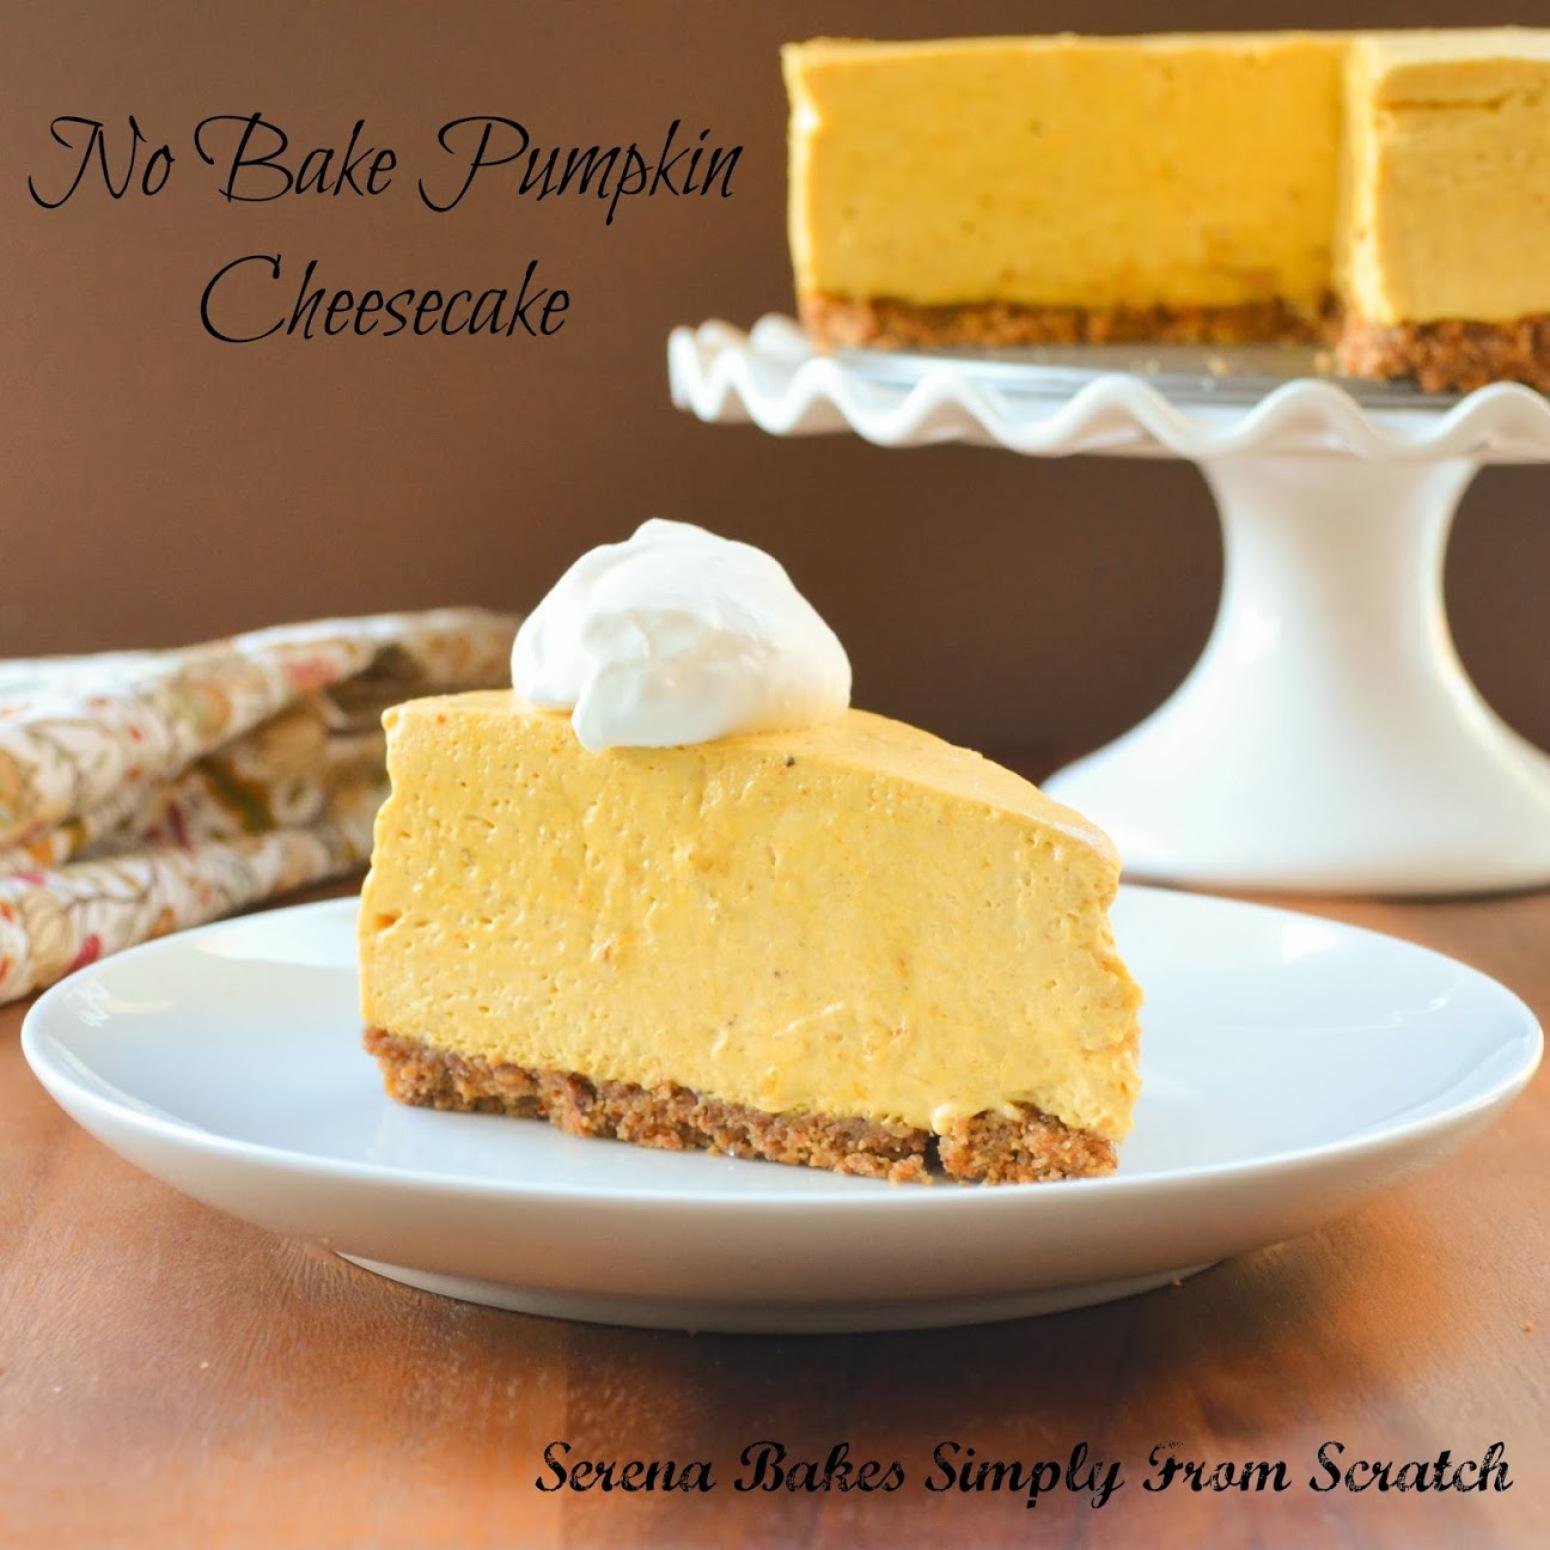 No Bake Pumpkin Cheesecake With Toasted Pecan Graham Cracker Crust ...